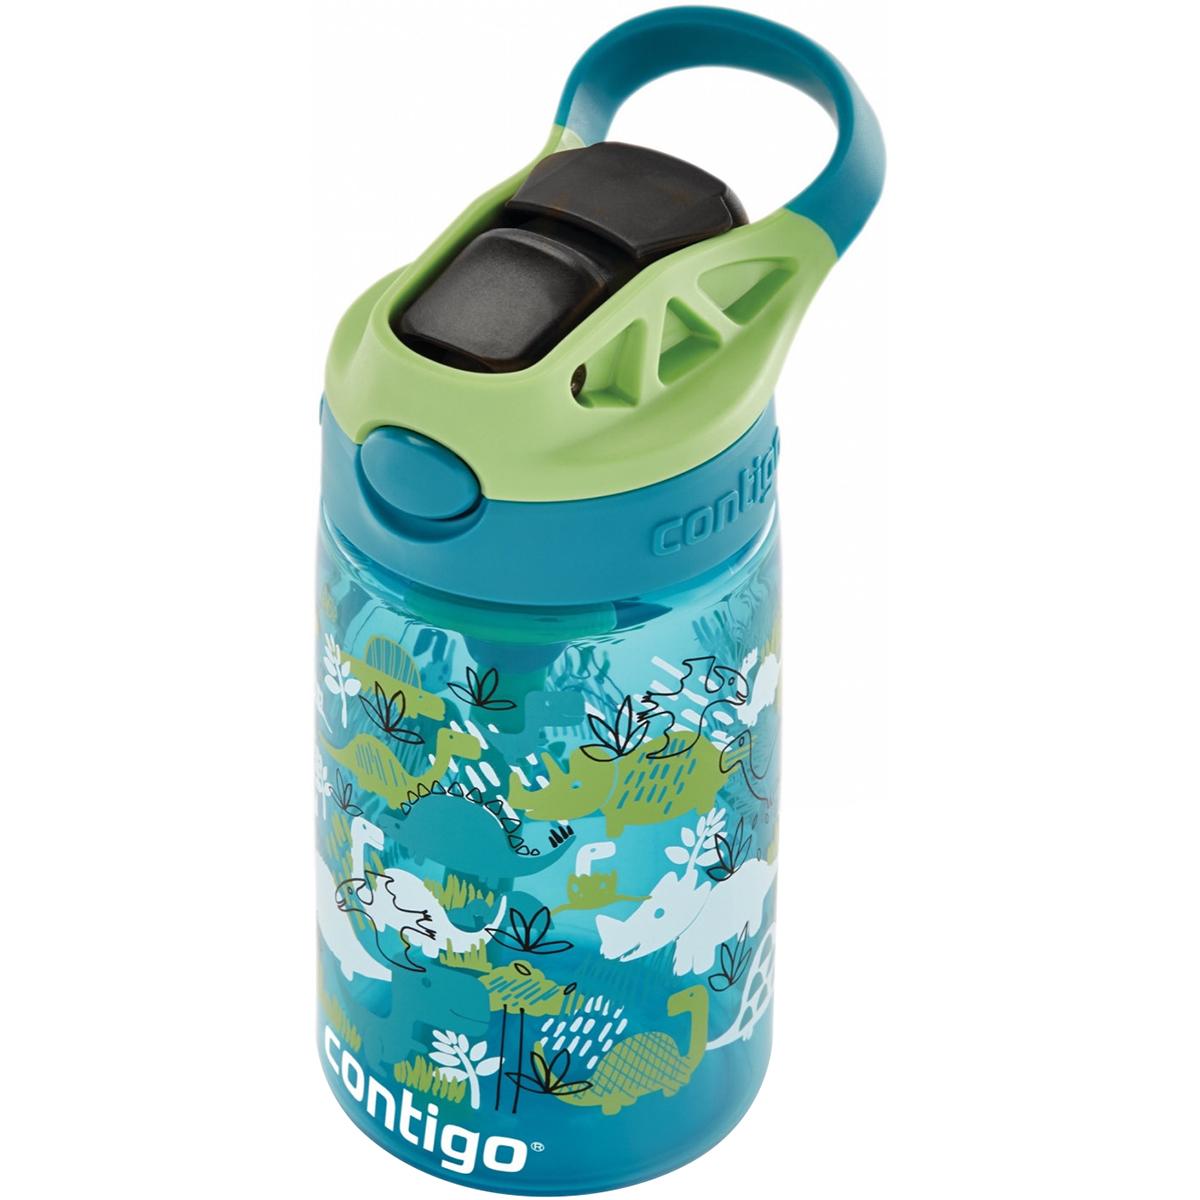 Contigo-Kid-039-s-14-oz-AutoSpout-Straw-Water-Bottle-with-Easy-Clean-Lid thumbnail 9